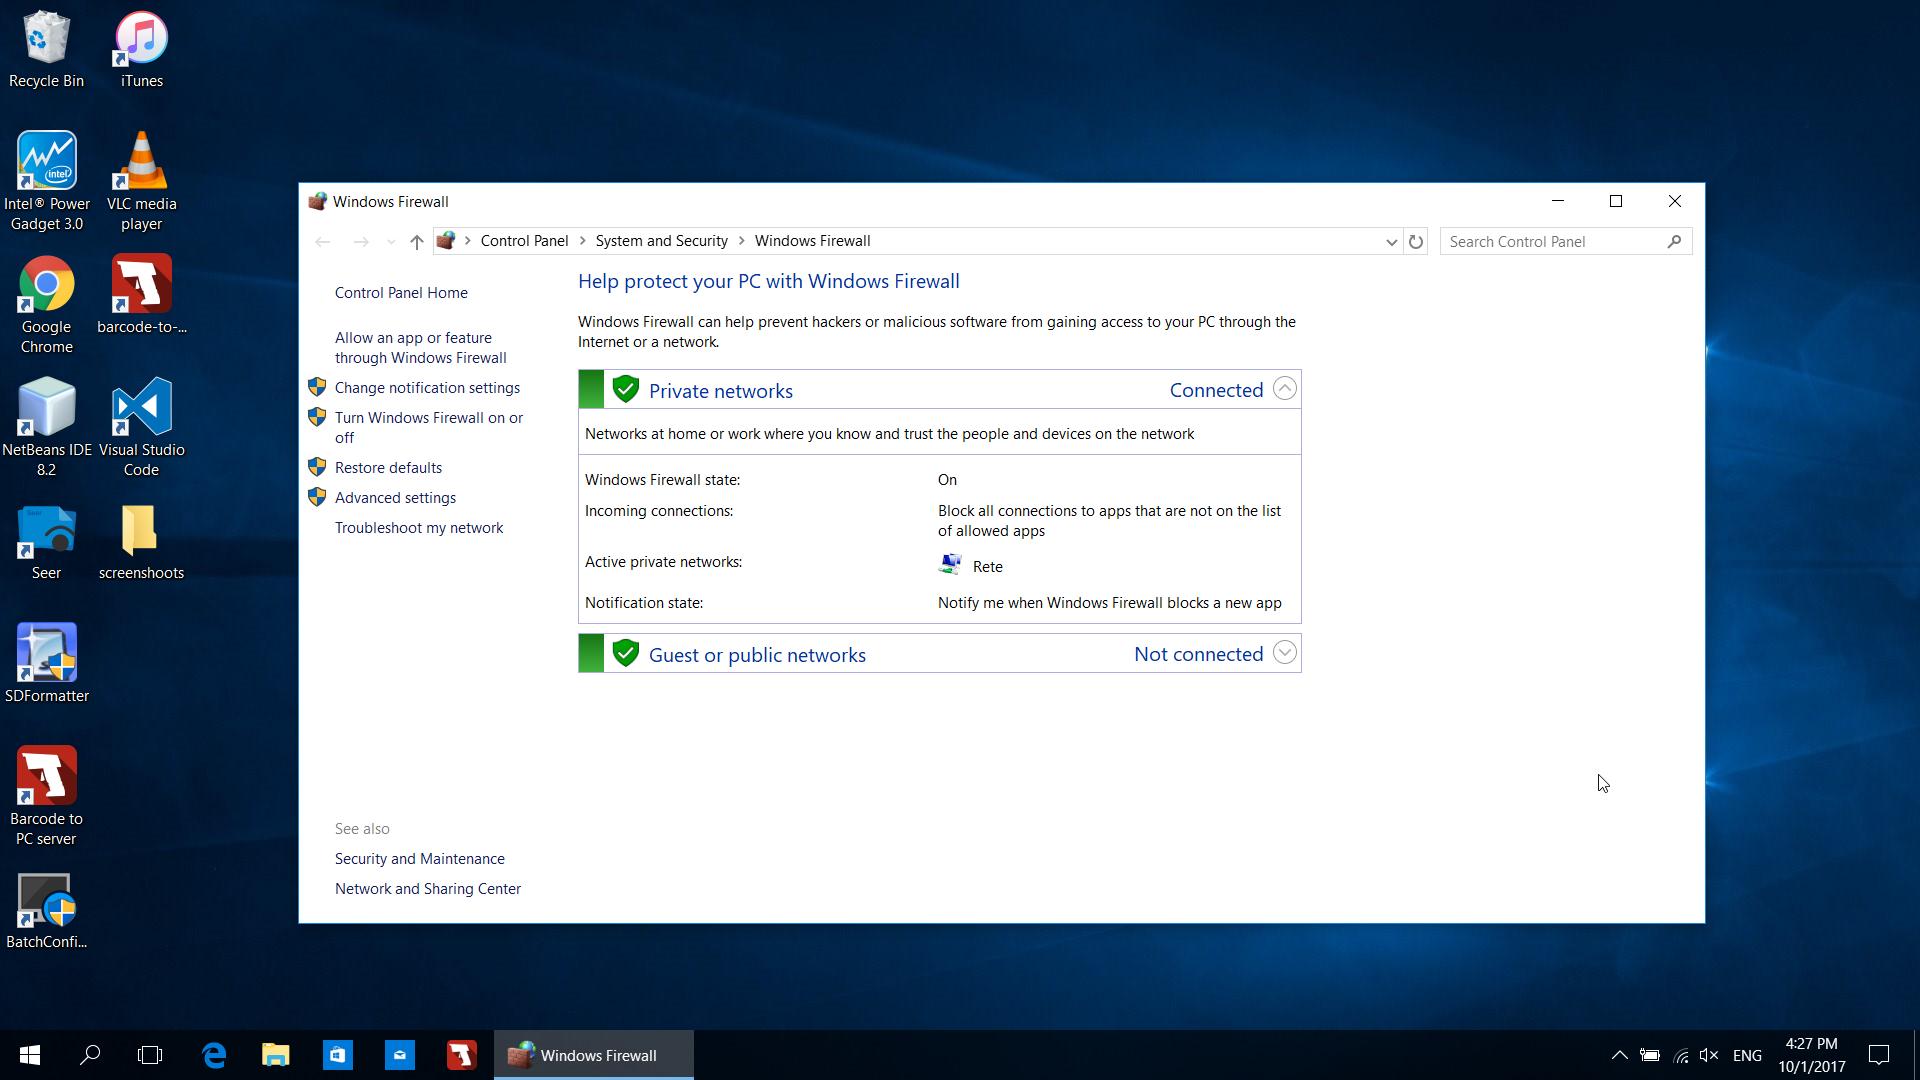 Windows 7 Photos App